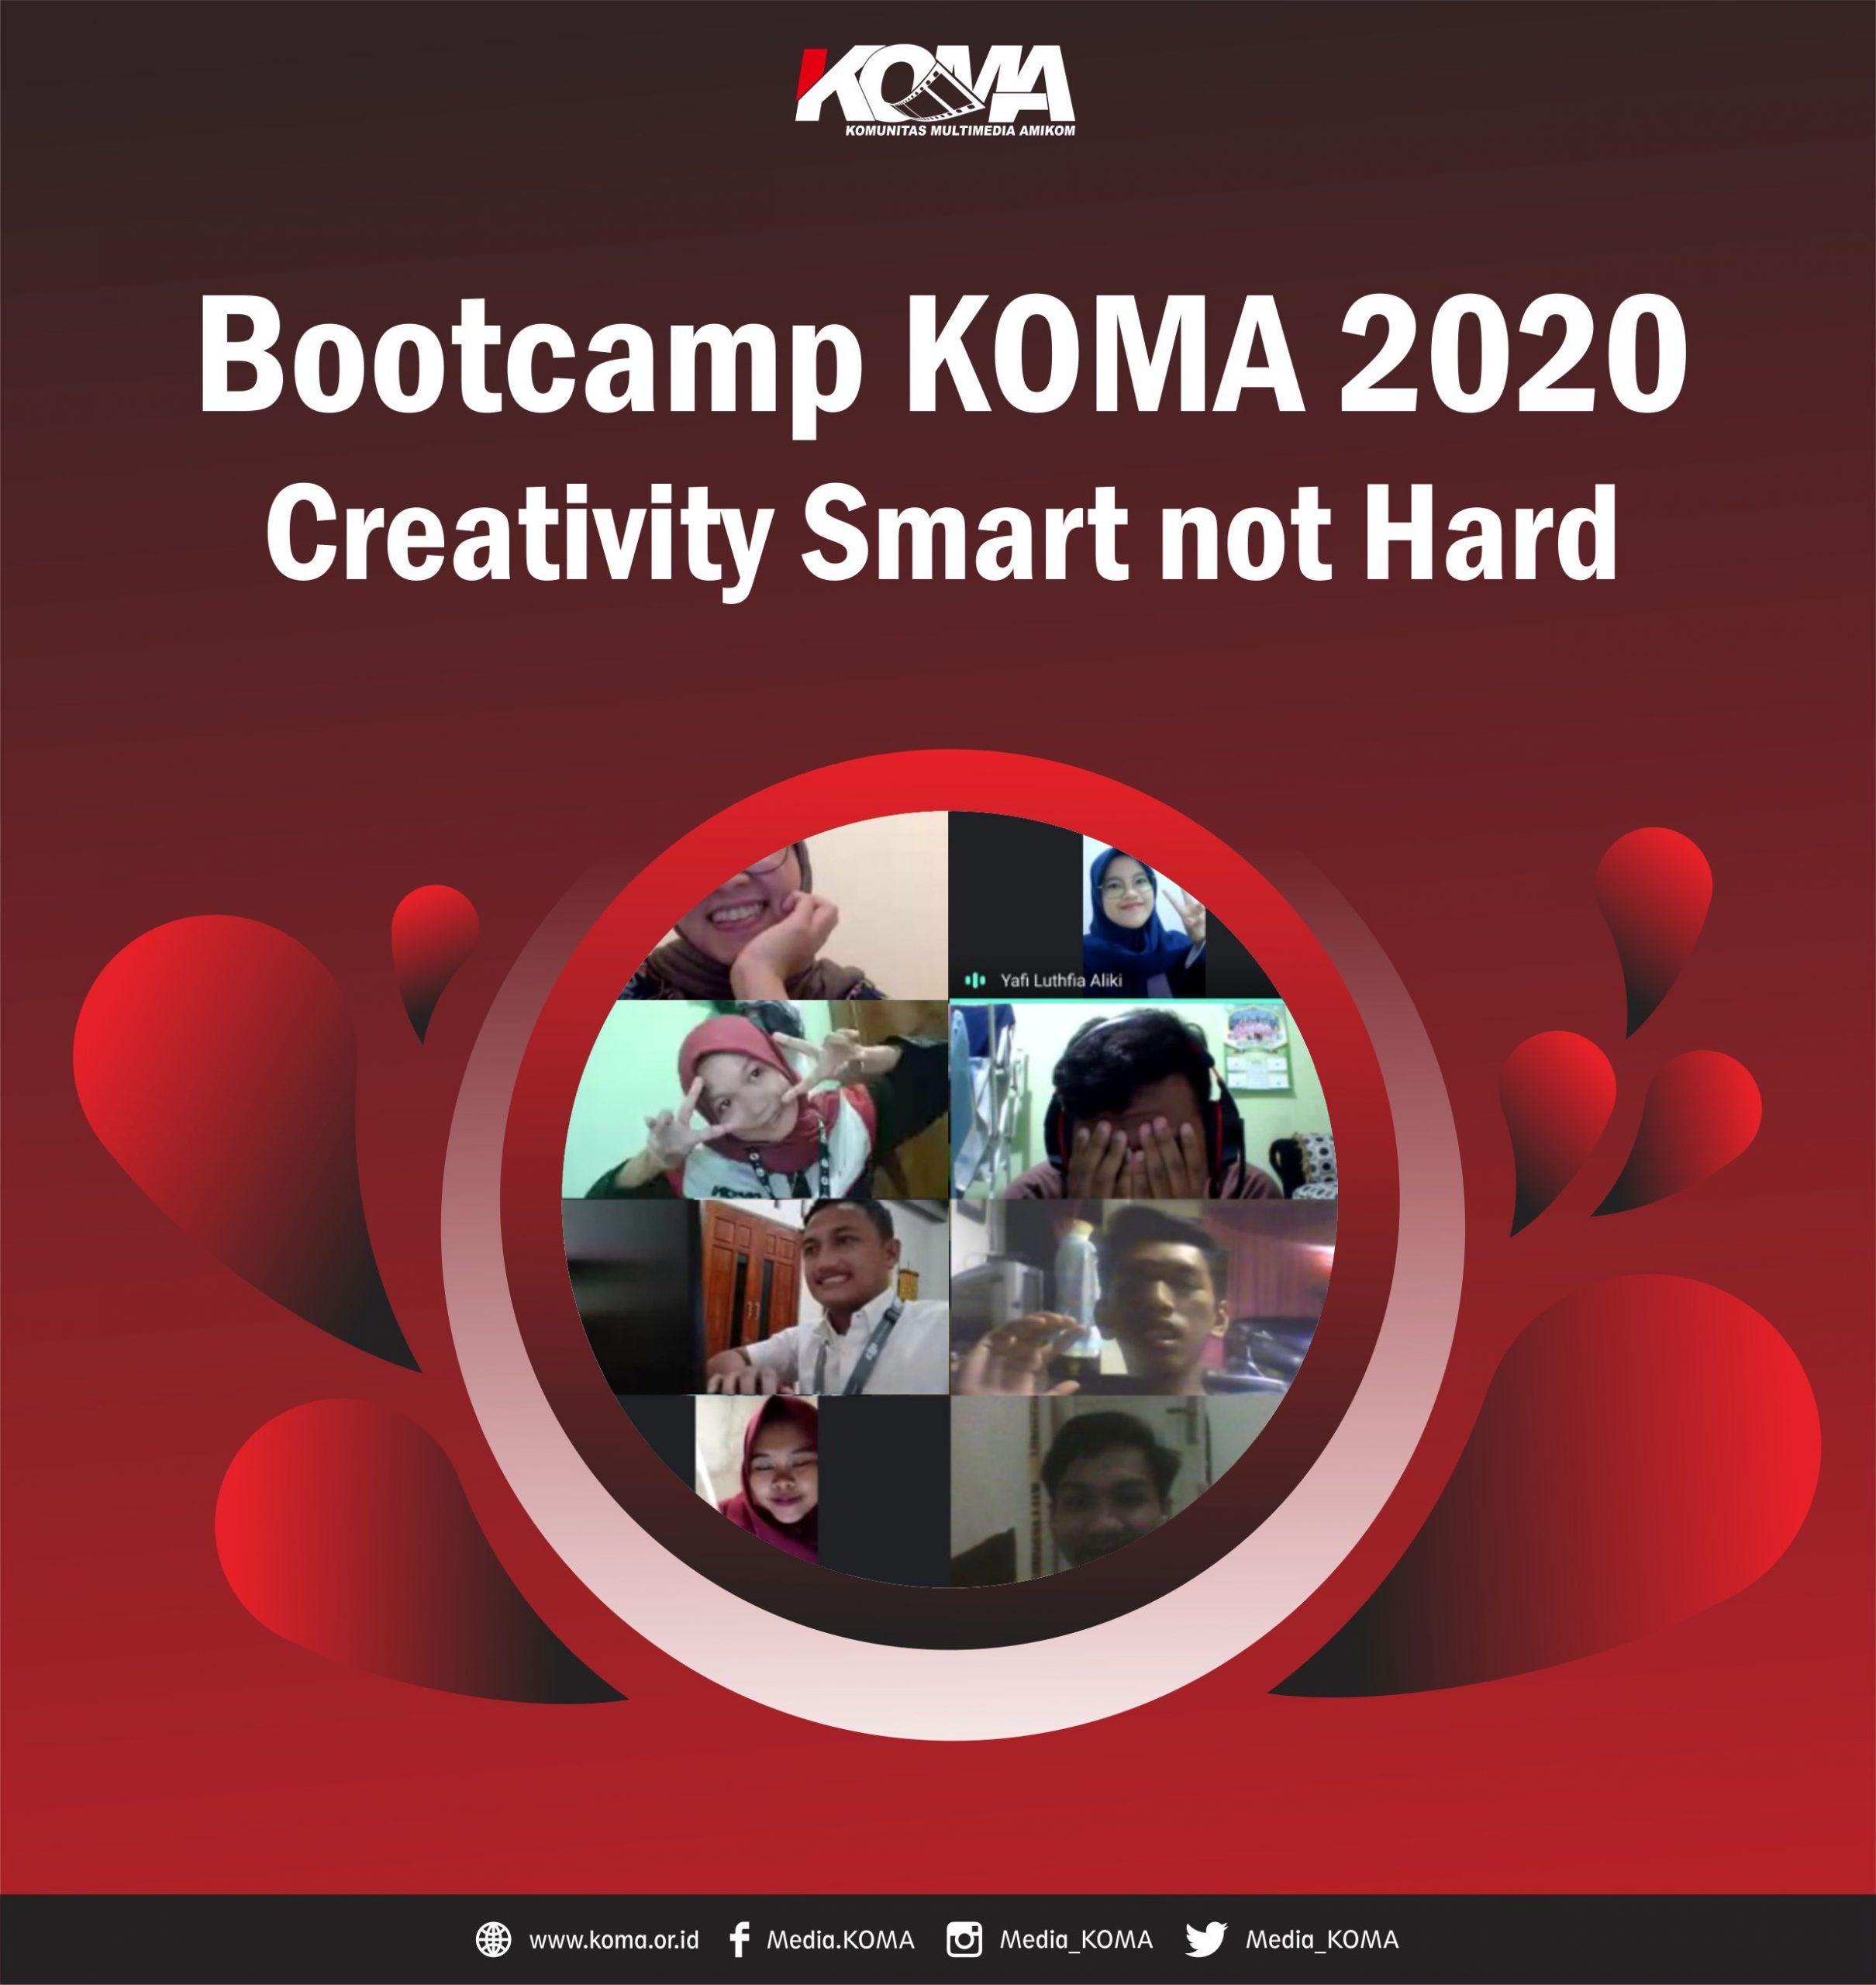 Boocamp